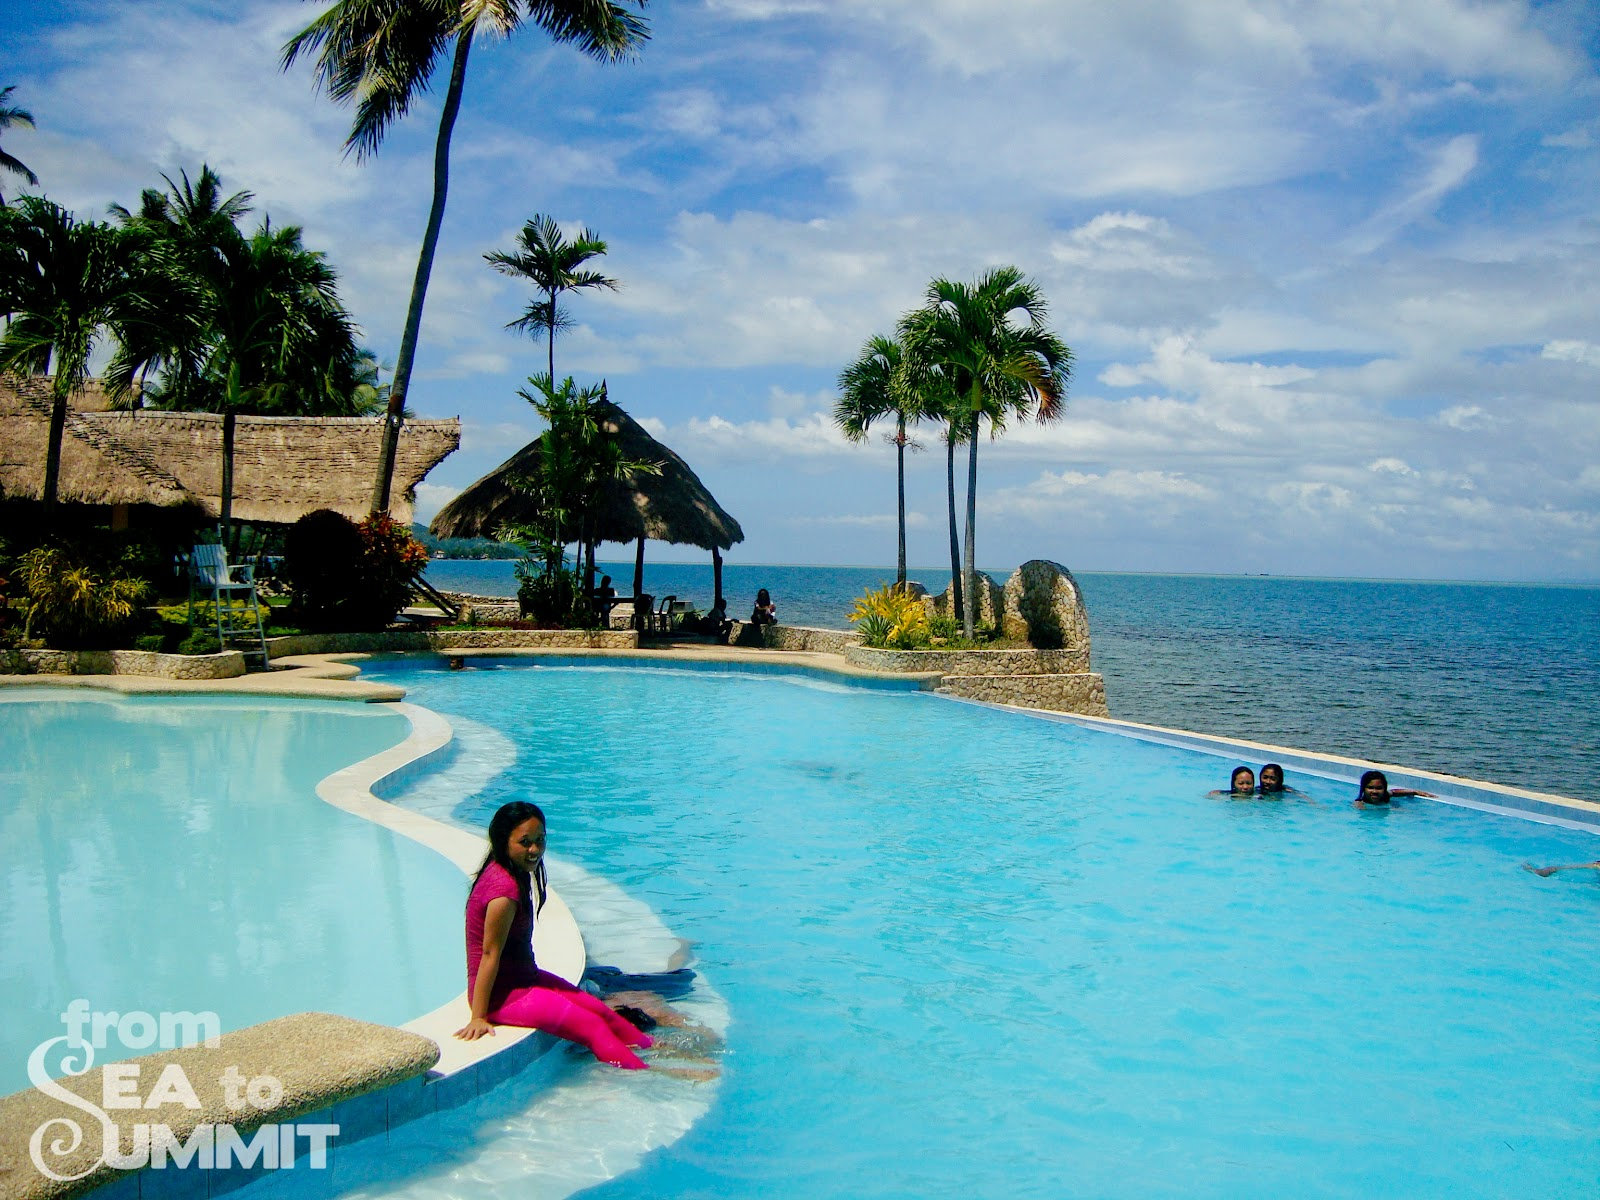 La Libertad Negros Lalimar Beach Resort From Sea To Summit